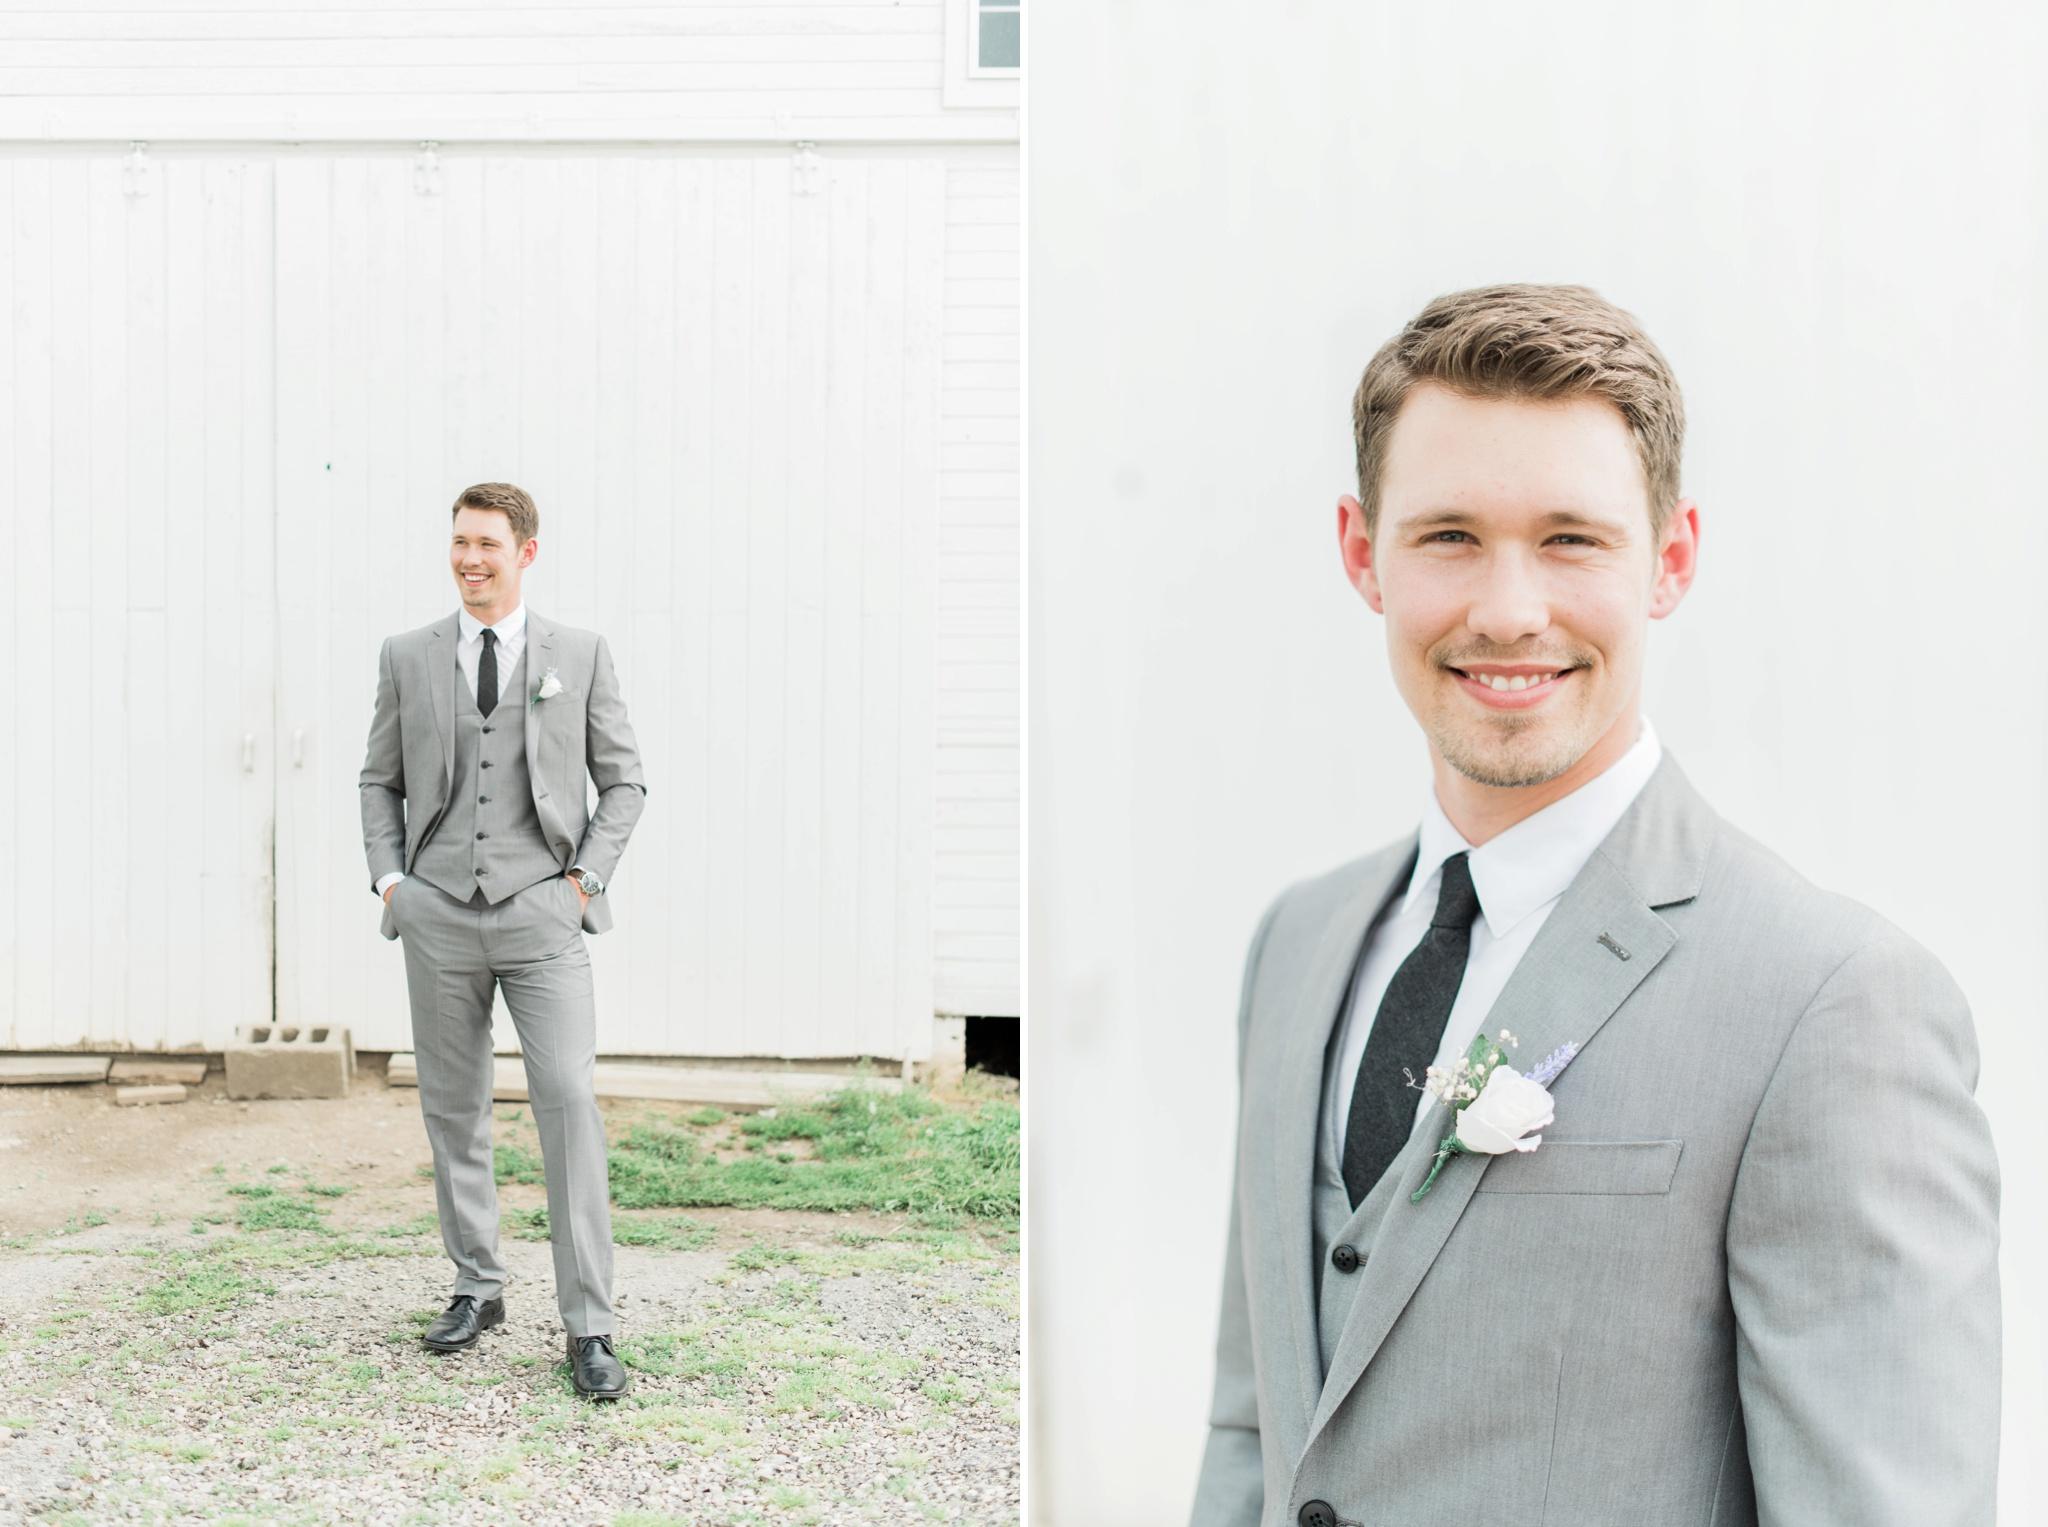 niederman-farm-wedding-cincinnati-ohio-photographer_0045.jpg